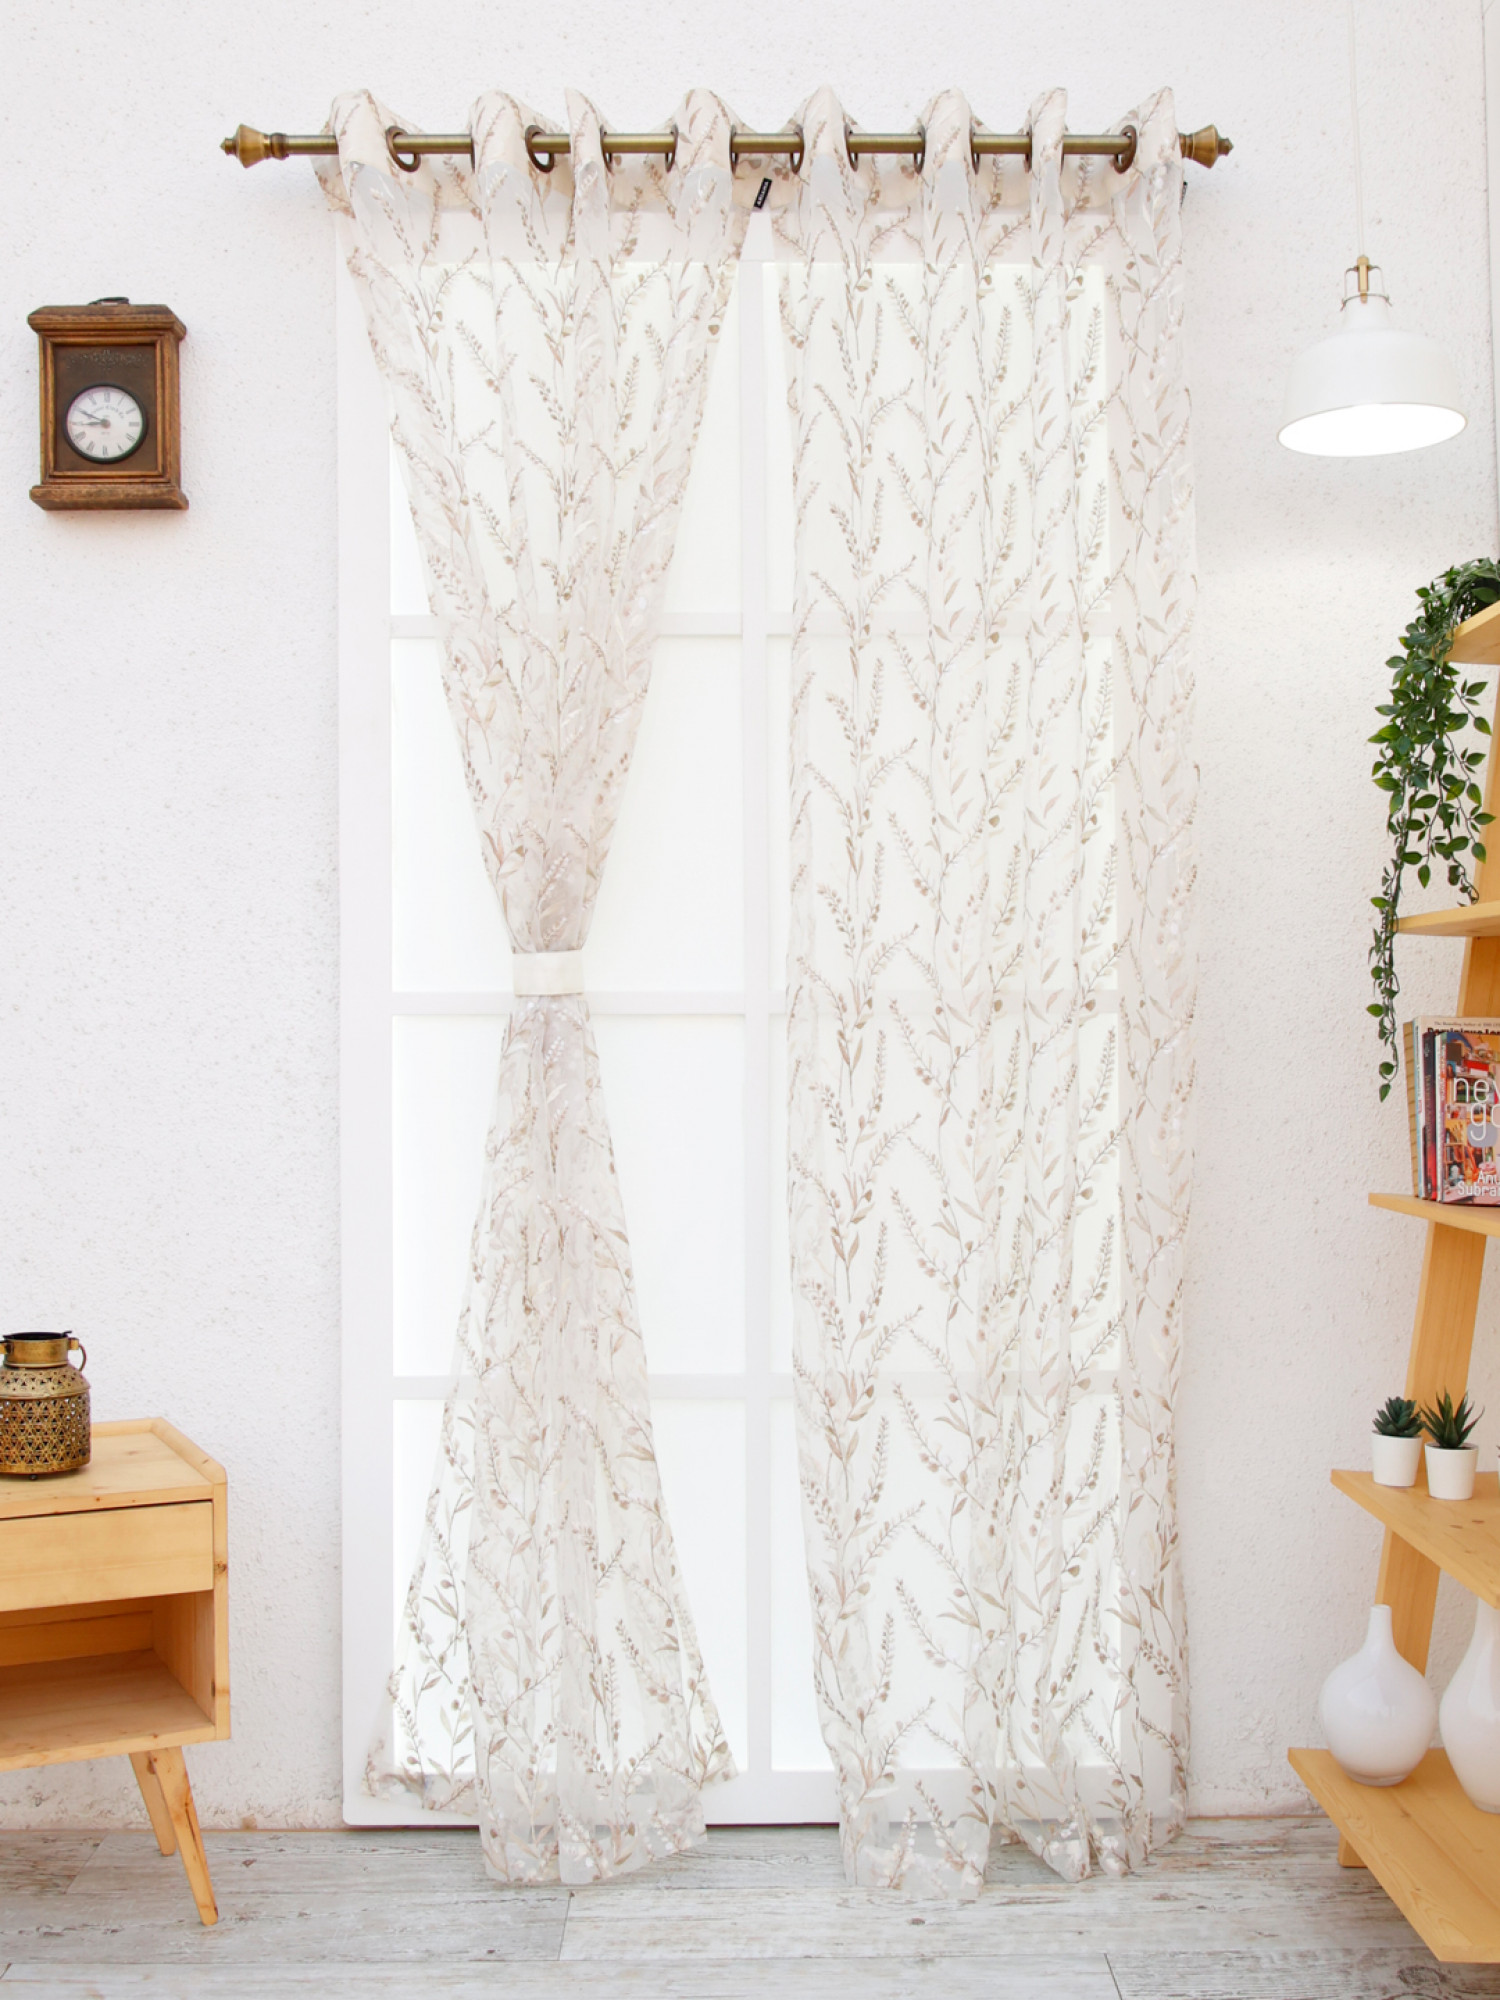 Sweet pea Sheer Curtain